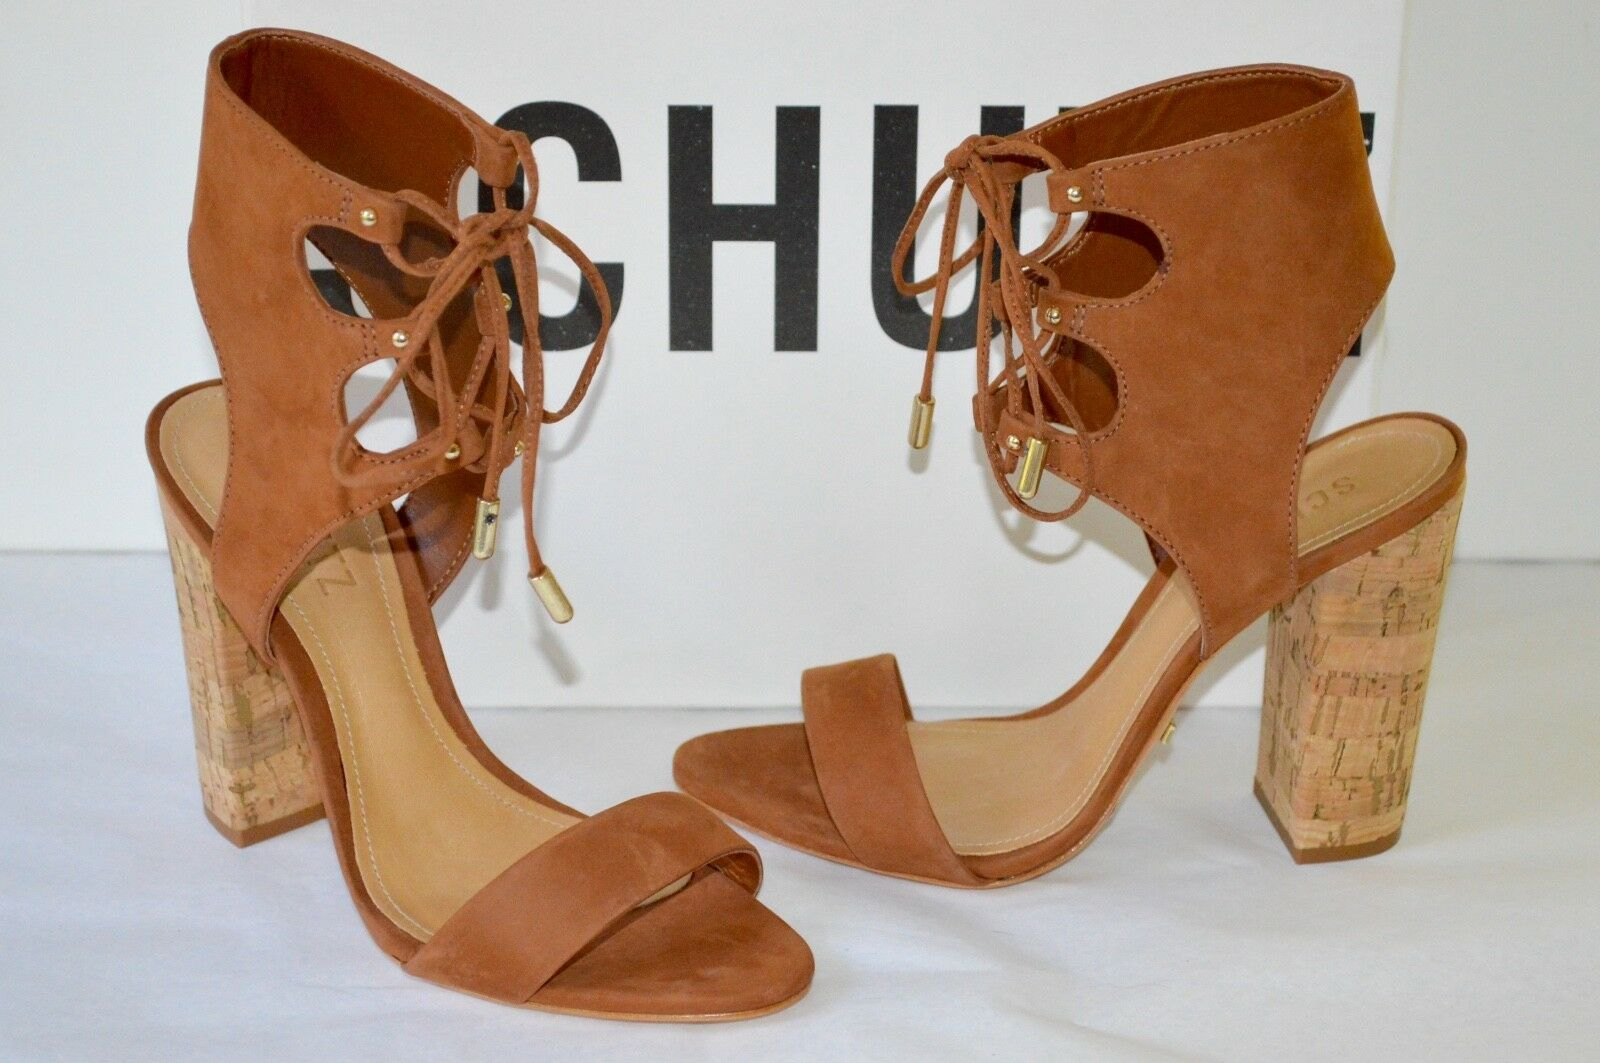 New $220 Schutz Cruz Saddle Brown Nubuck Suede Cuff 6 Sandal Heel  sz 6 Cuff bedcdd